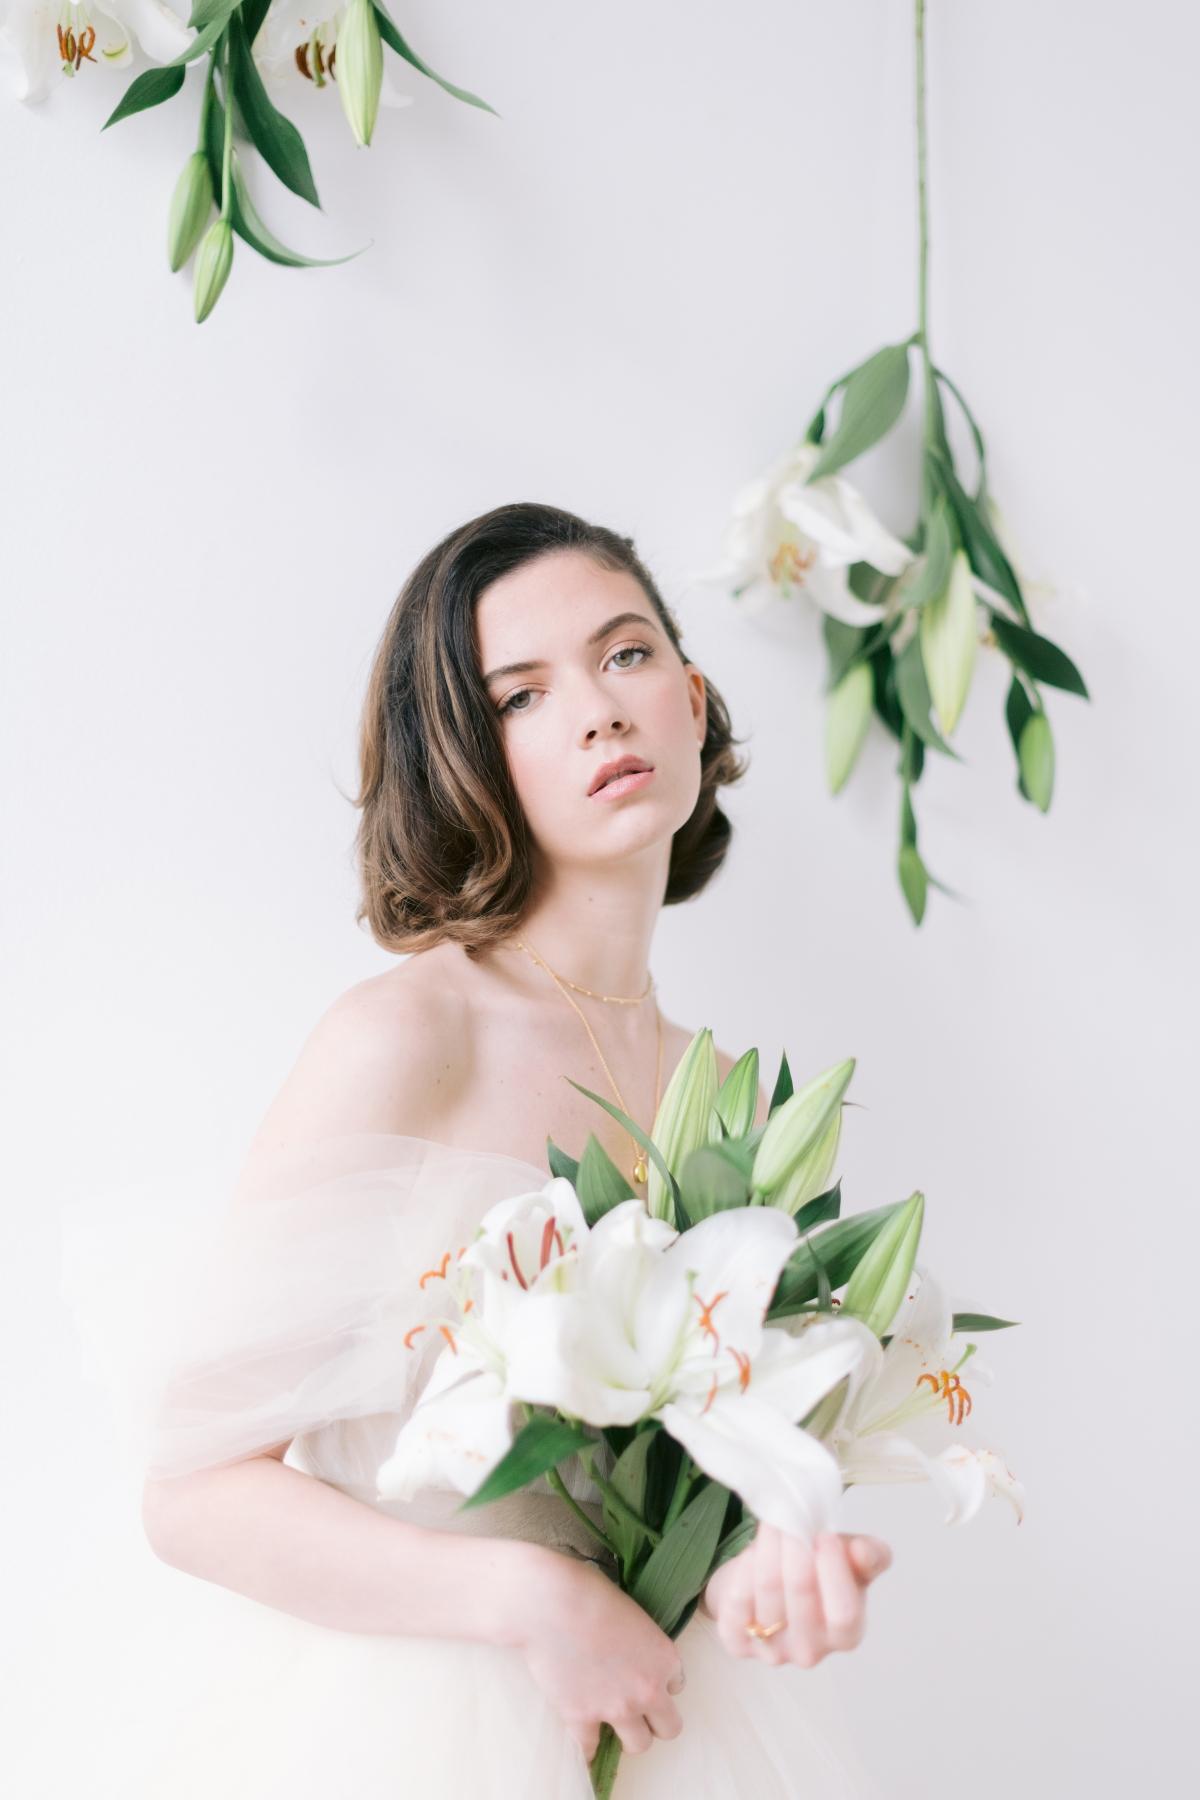 Laura Lanzerotte Bridal Danielle Heinson Photography 35